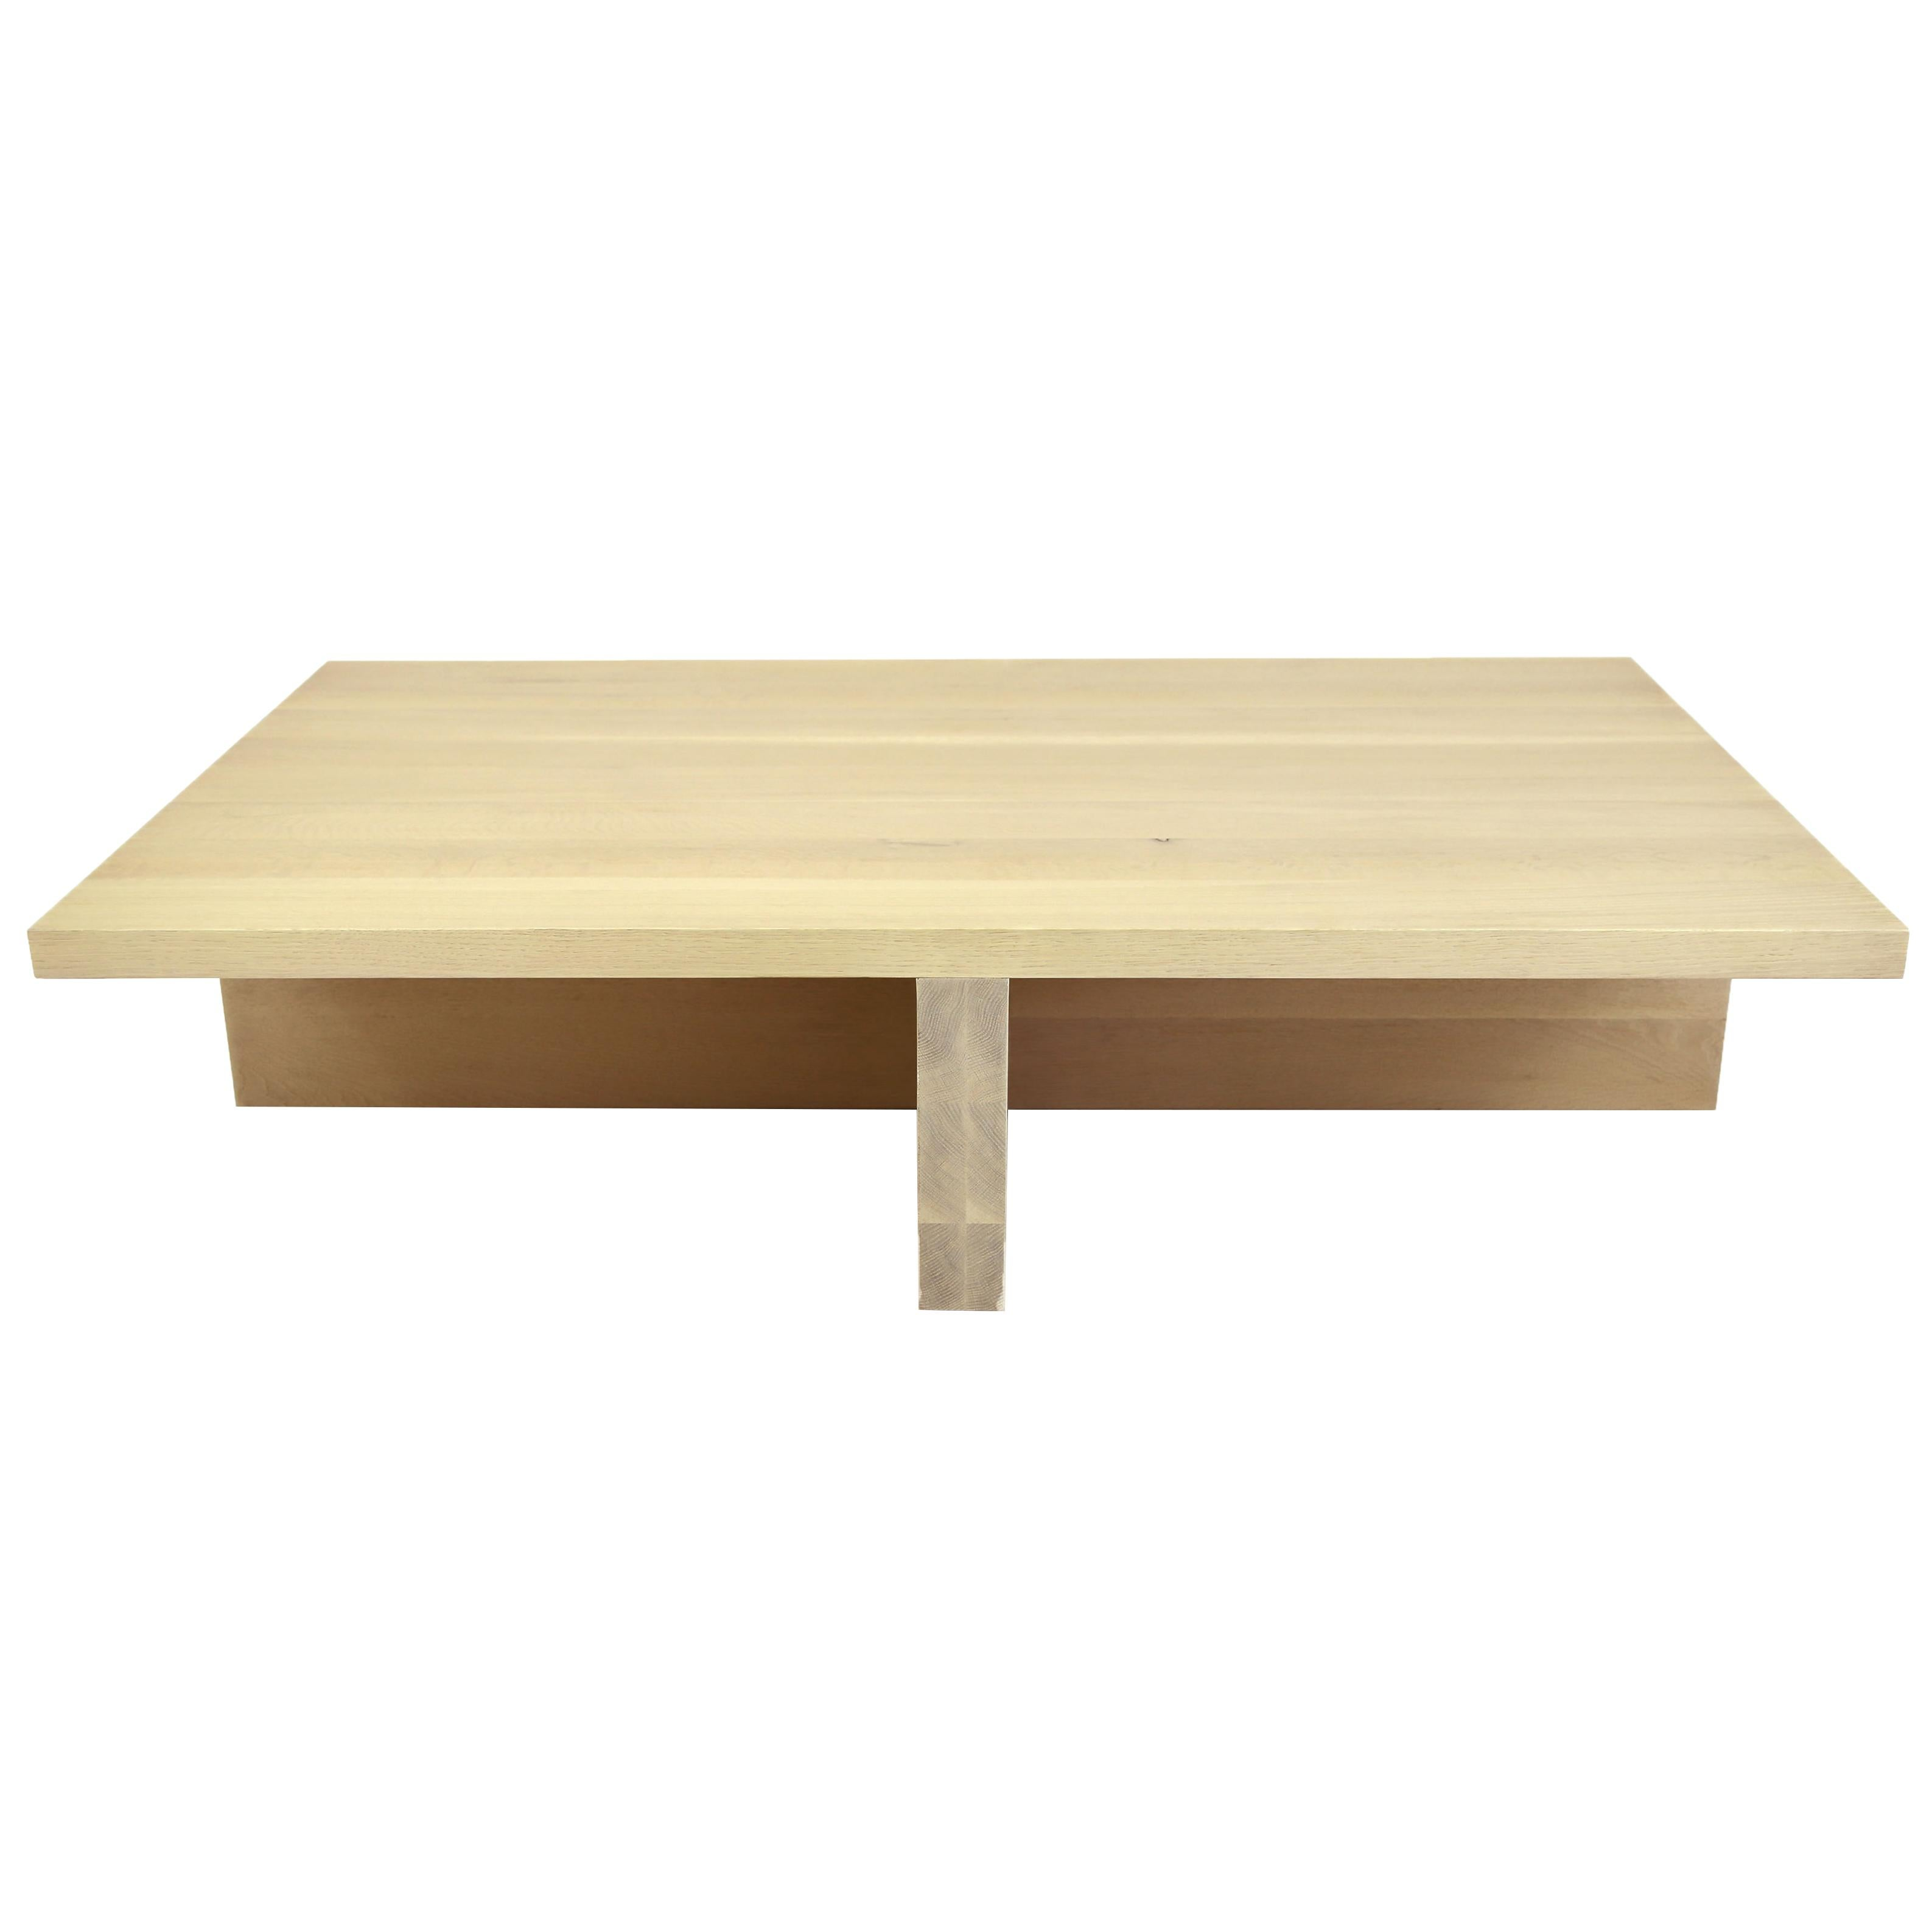 Genial Shimna White Oak Minimal Coffee Table For Sale